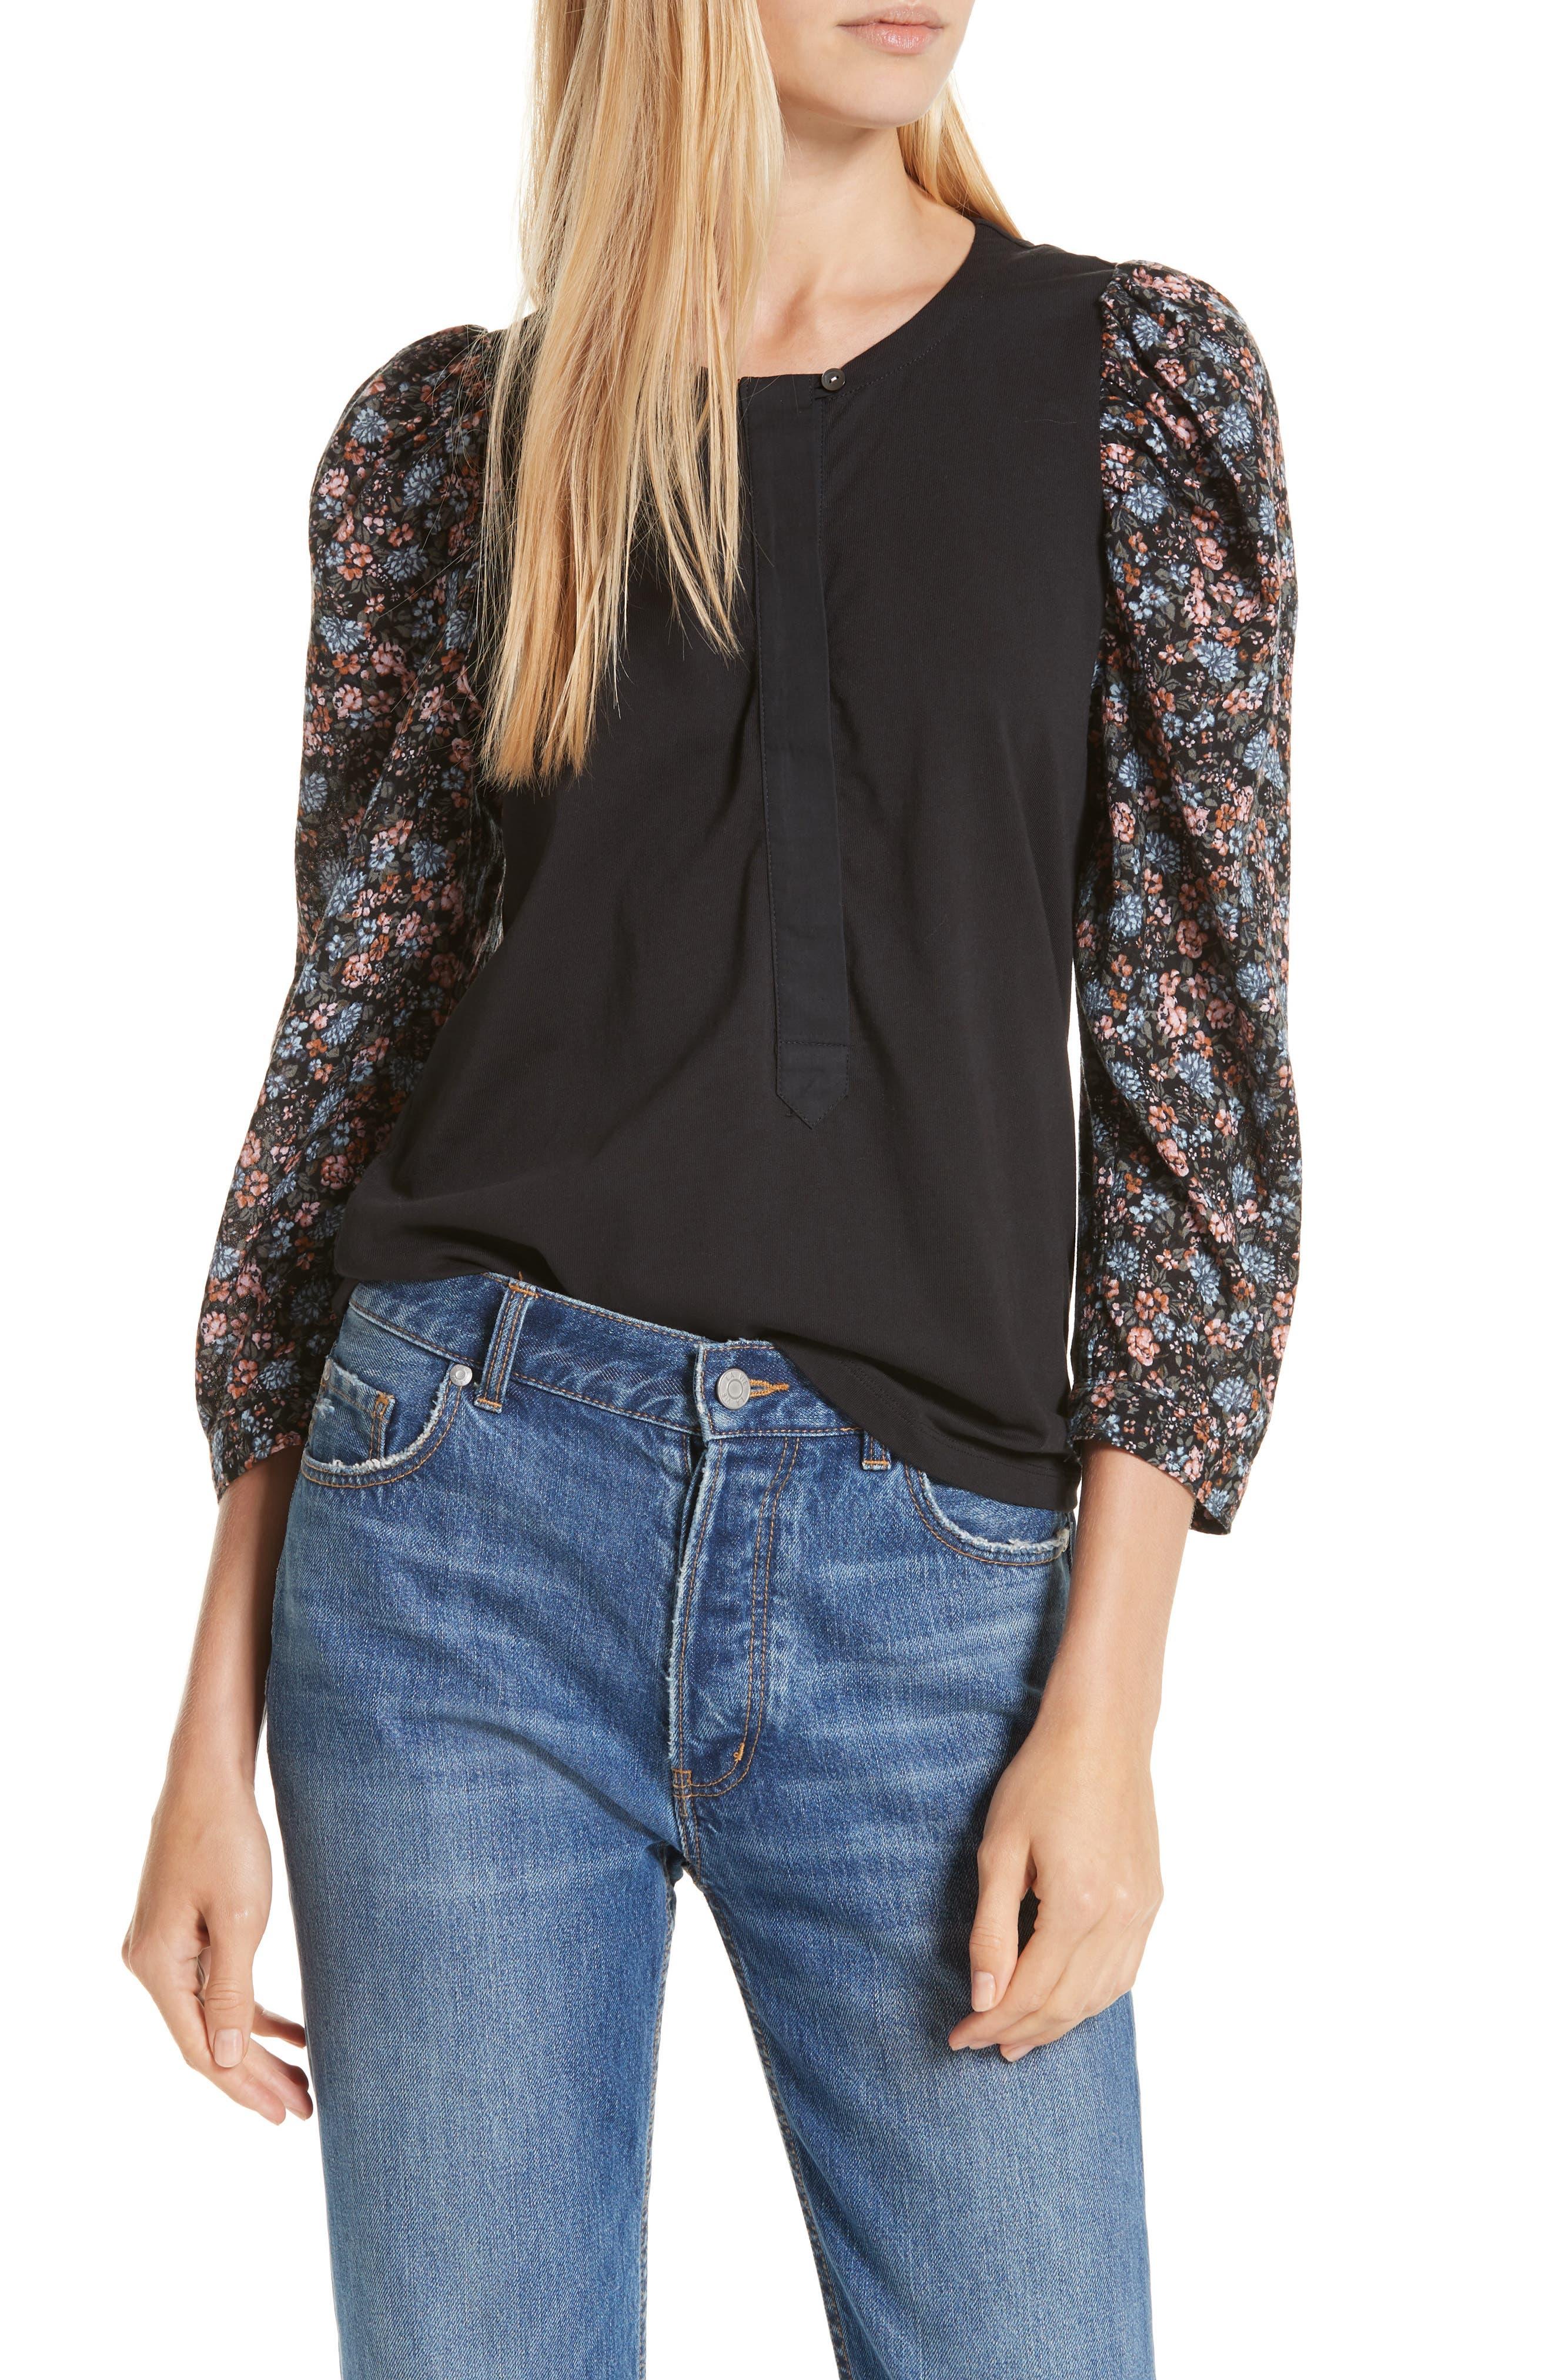 LA VIE REBECCA TAYLOR Lisette Contrast Sleeve Top in Black Combo